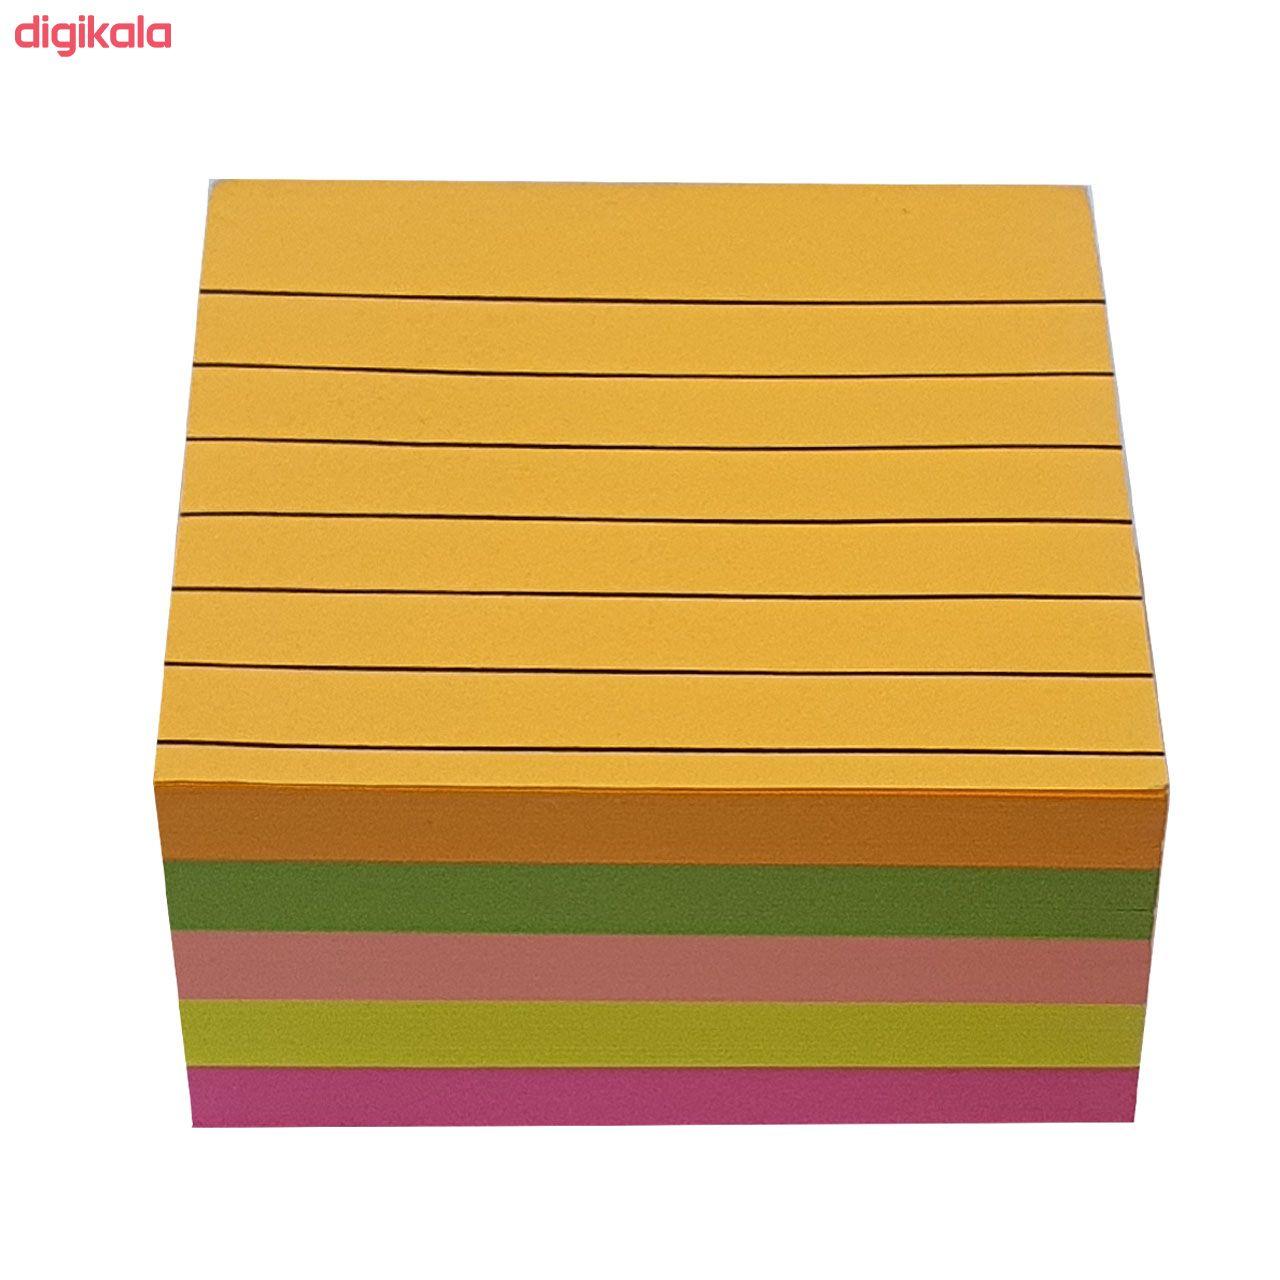 کاغذ یادداشت چسب دار  سان اسکای کد C400 main 1 1